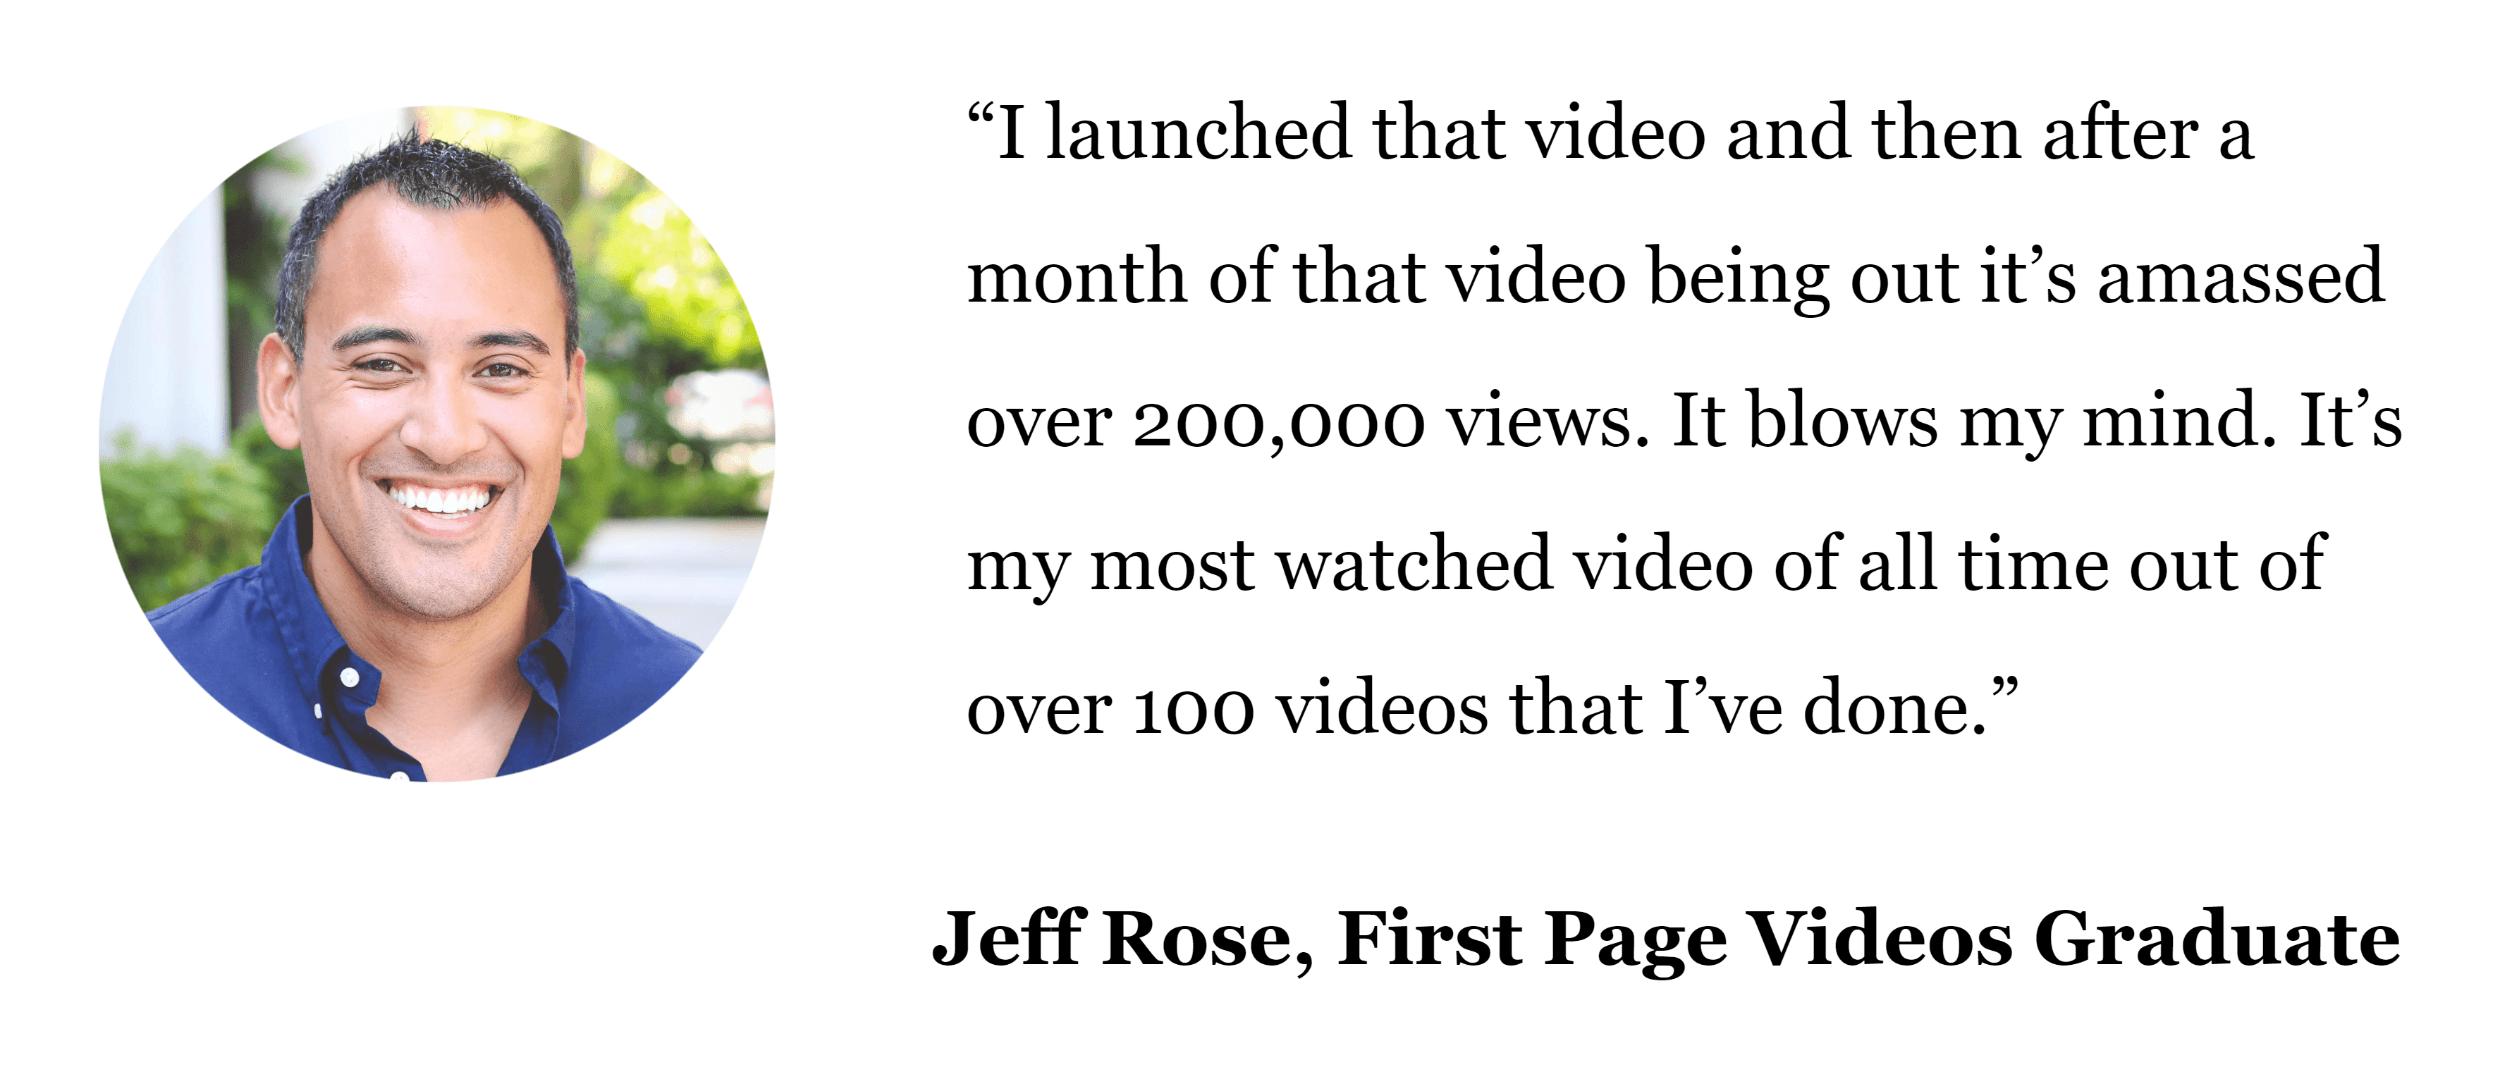 Firstpagevideos – Sales Page Testimonial